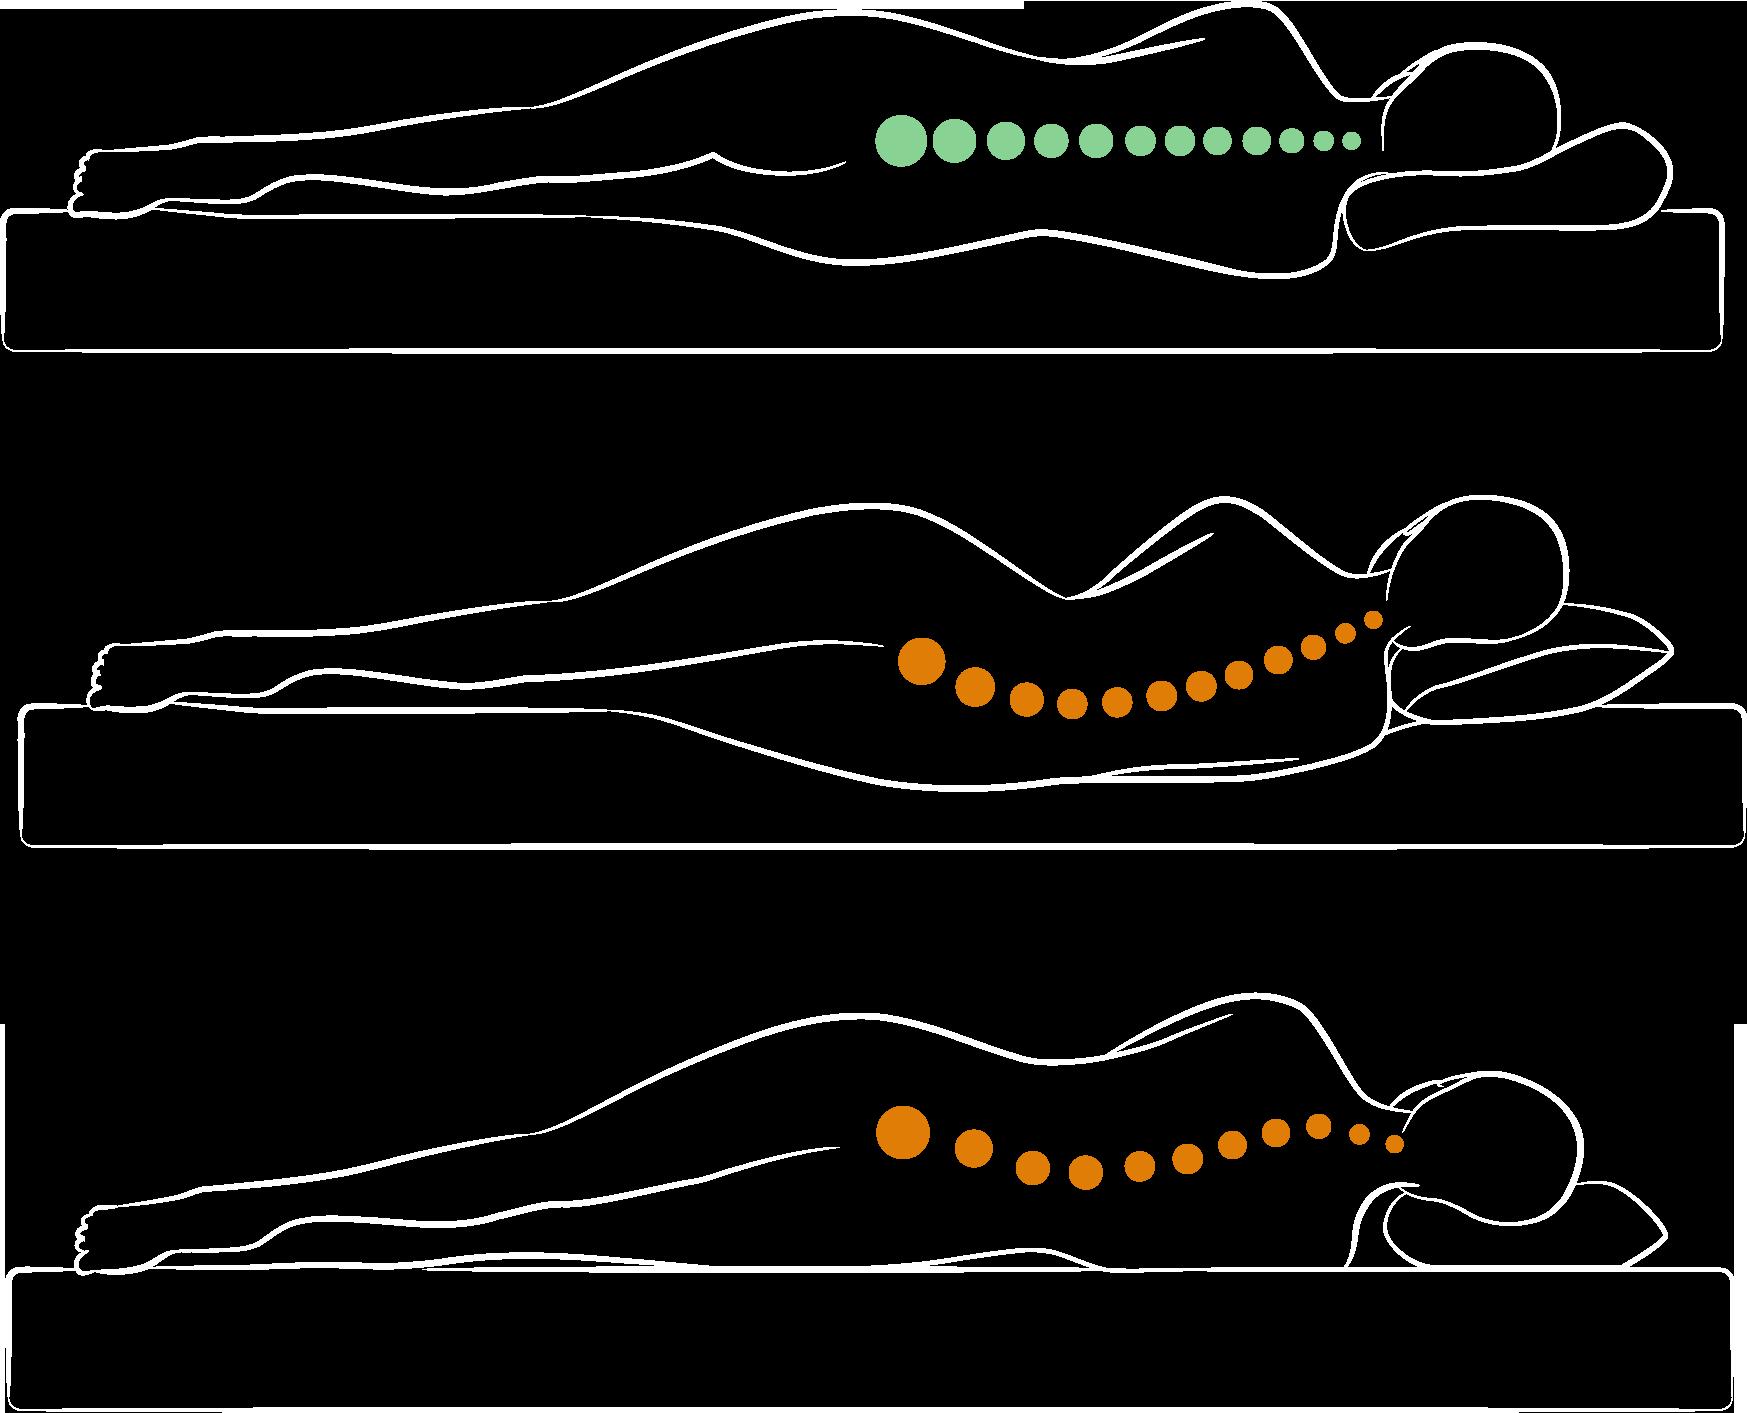 Anatomisch perfekt vermessen mit dem Wirbelscanner - Bettenhaus Horsch